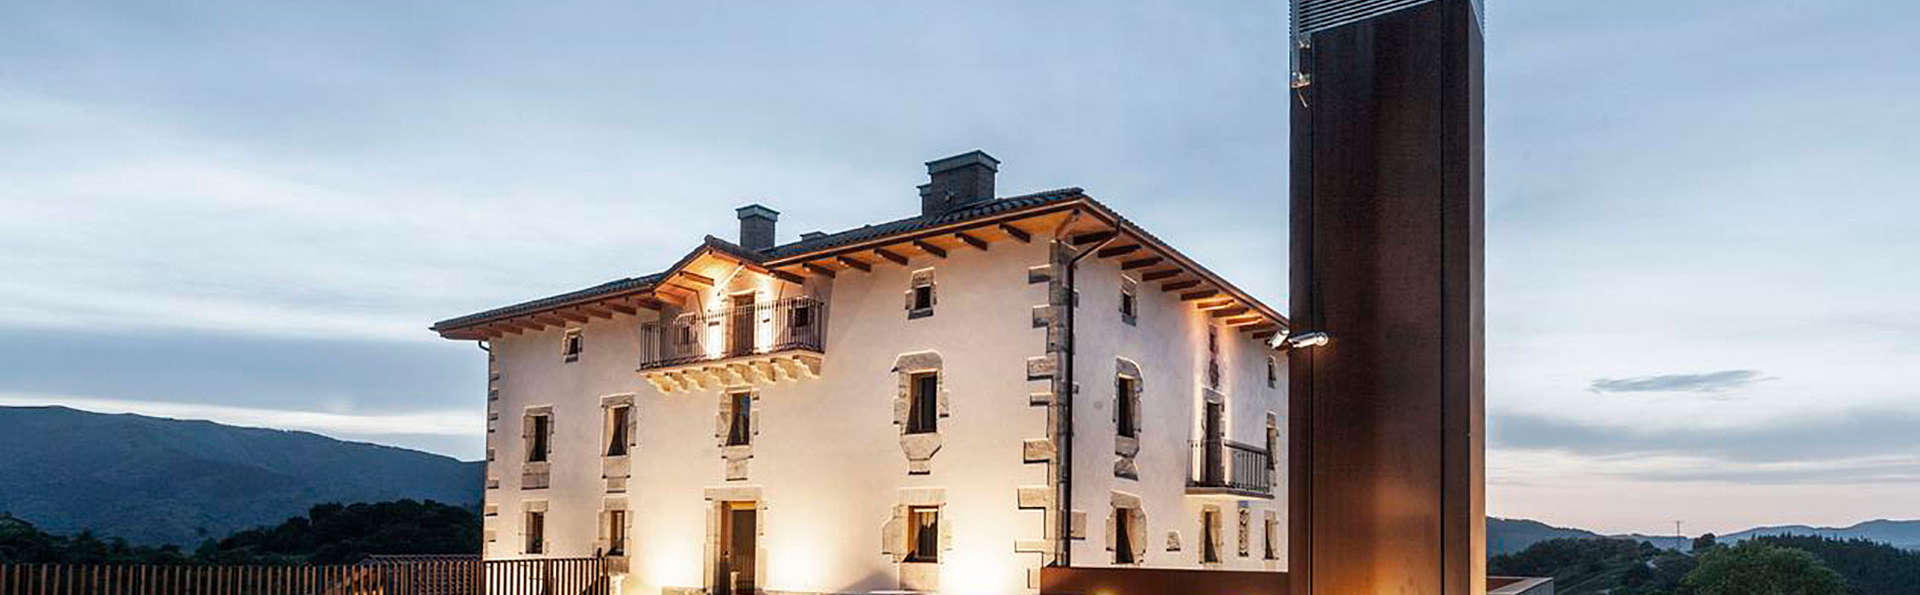 Palacio de Yrisarri by IrriSarri Land - EDIT_front219.jpg